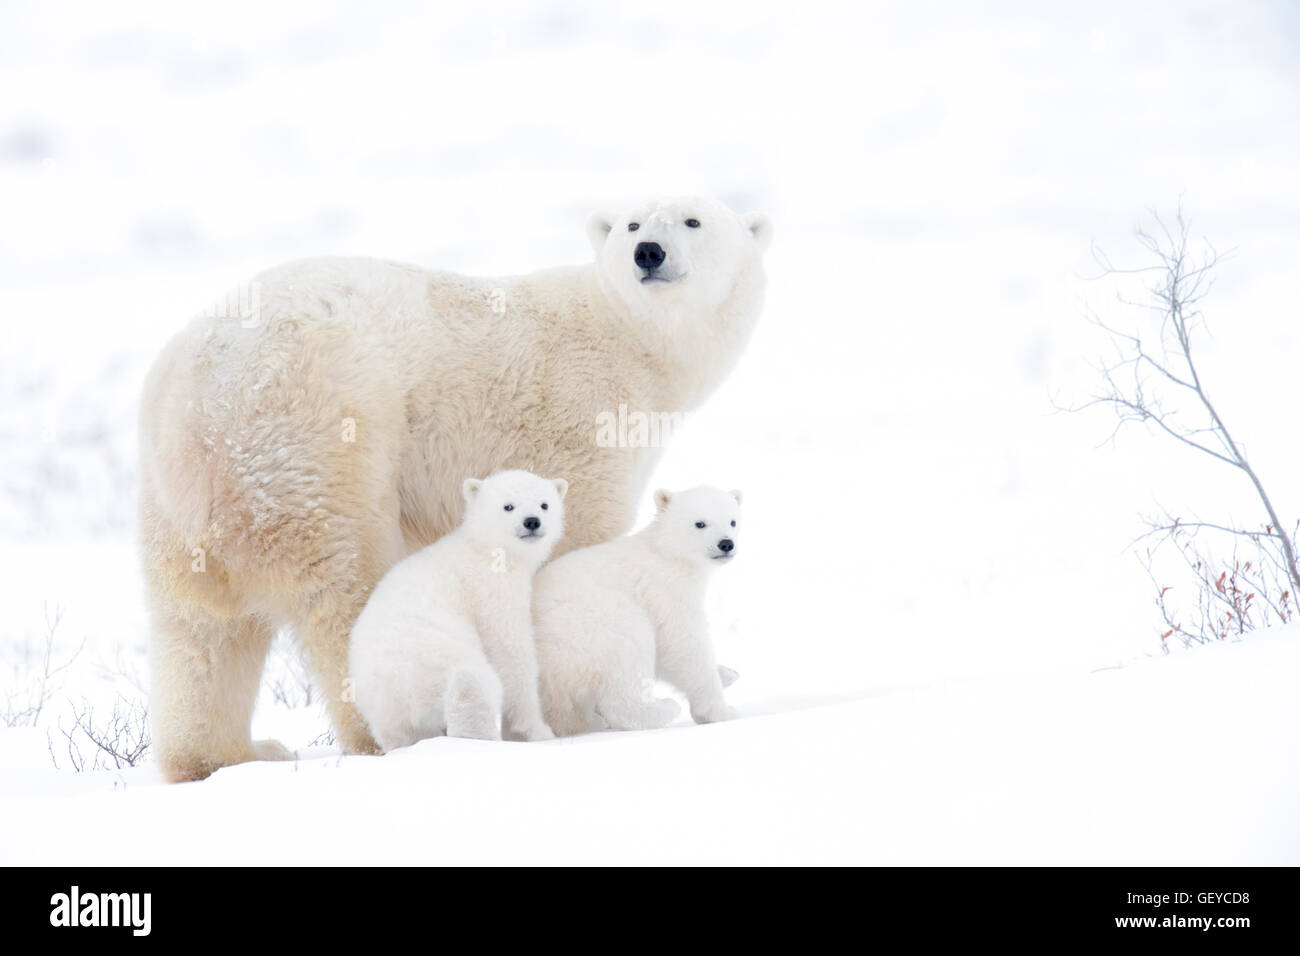 Polar bear mother (Ursus maritimus) with two cubs, Wapusk National Park, Manitoba, Canada - Stock Image